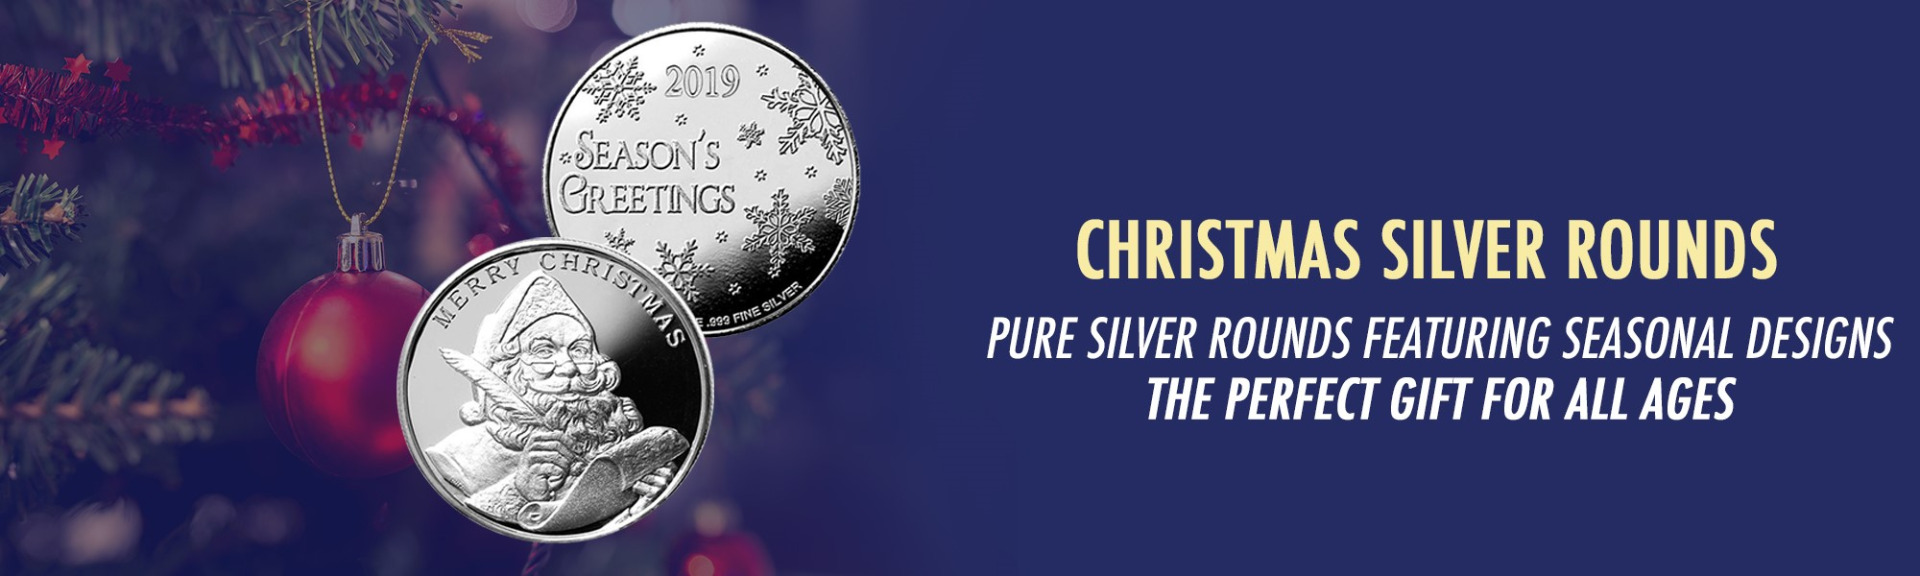 2019 Santa Christmas Silver Rounds